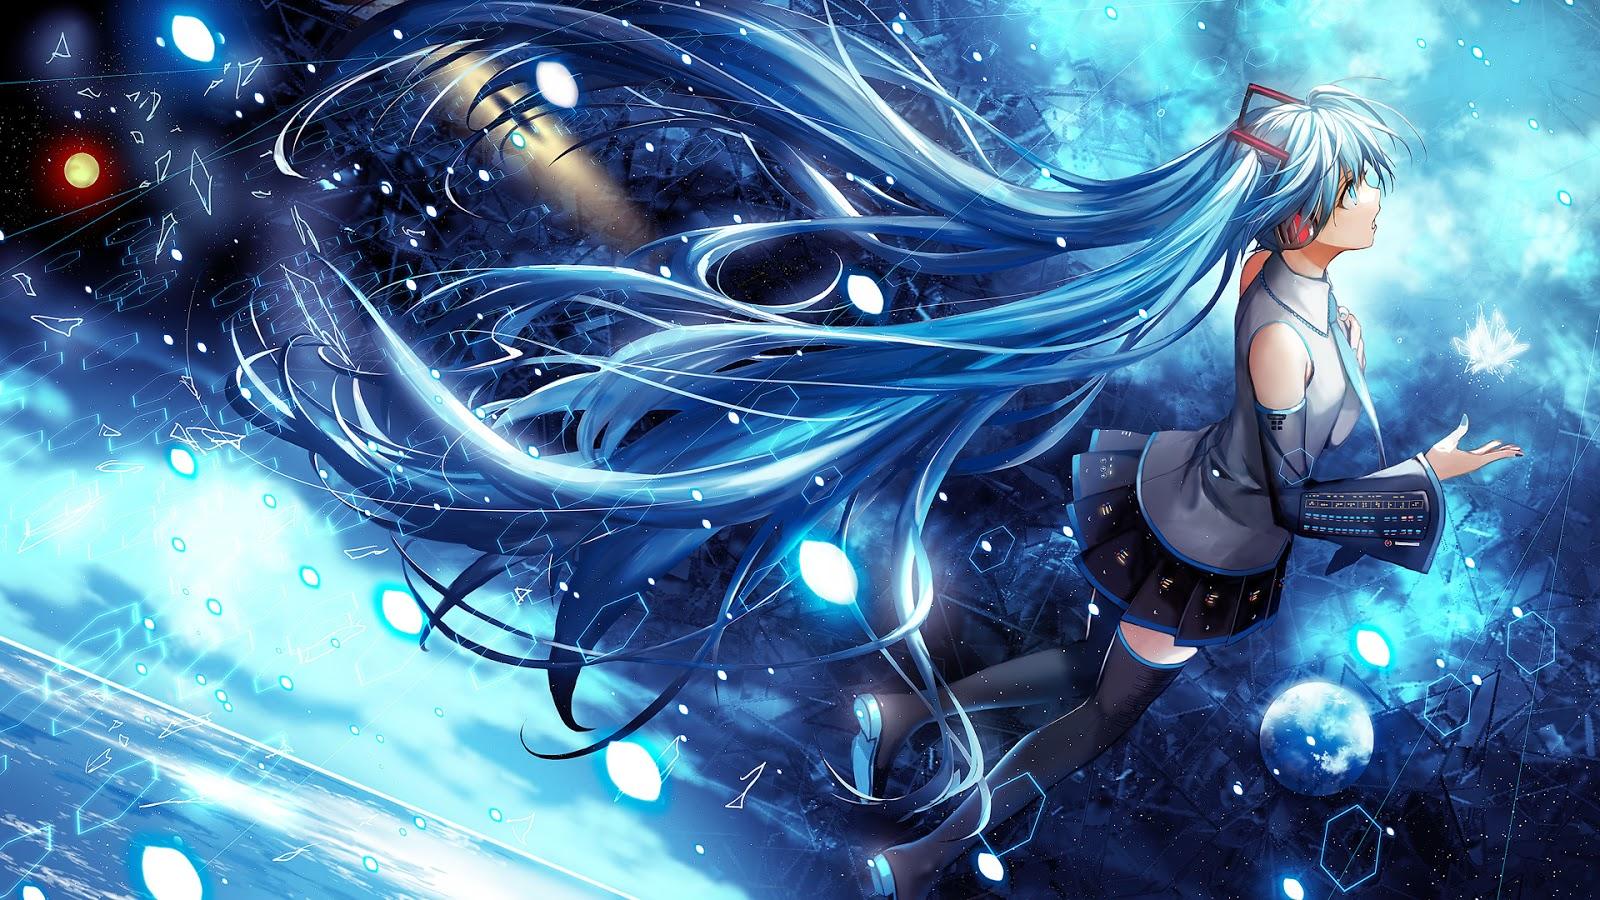 Download kumpulan fan art dan wallpaper anime keren hd - Wallpaper anime hd untuk pc ...